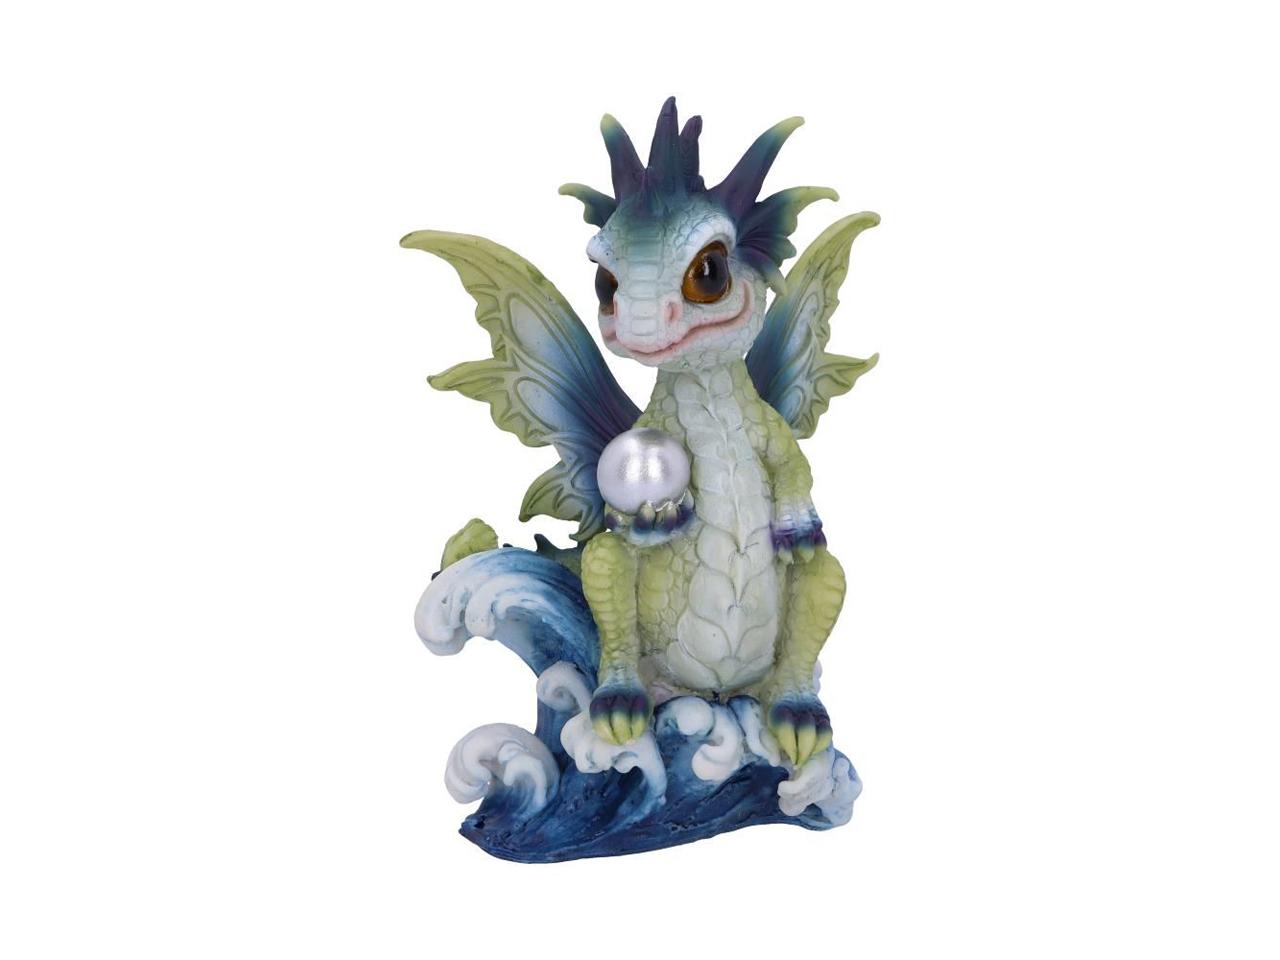 Water Hatchling Sea Dragon Figurine Ornament Pearl Silver Metallic Orb Green Blue Nemesis Now